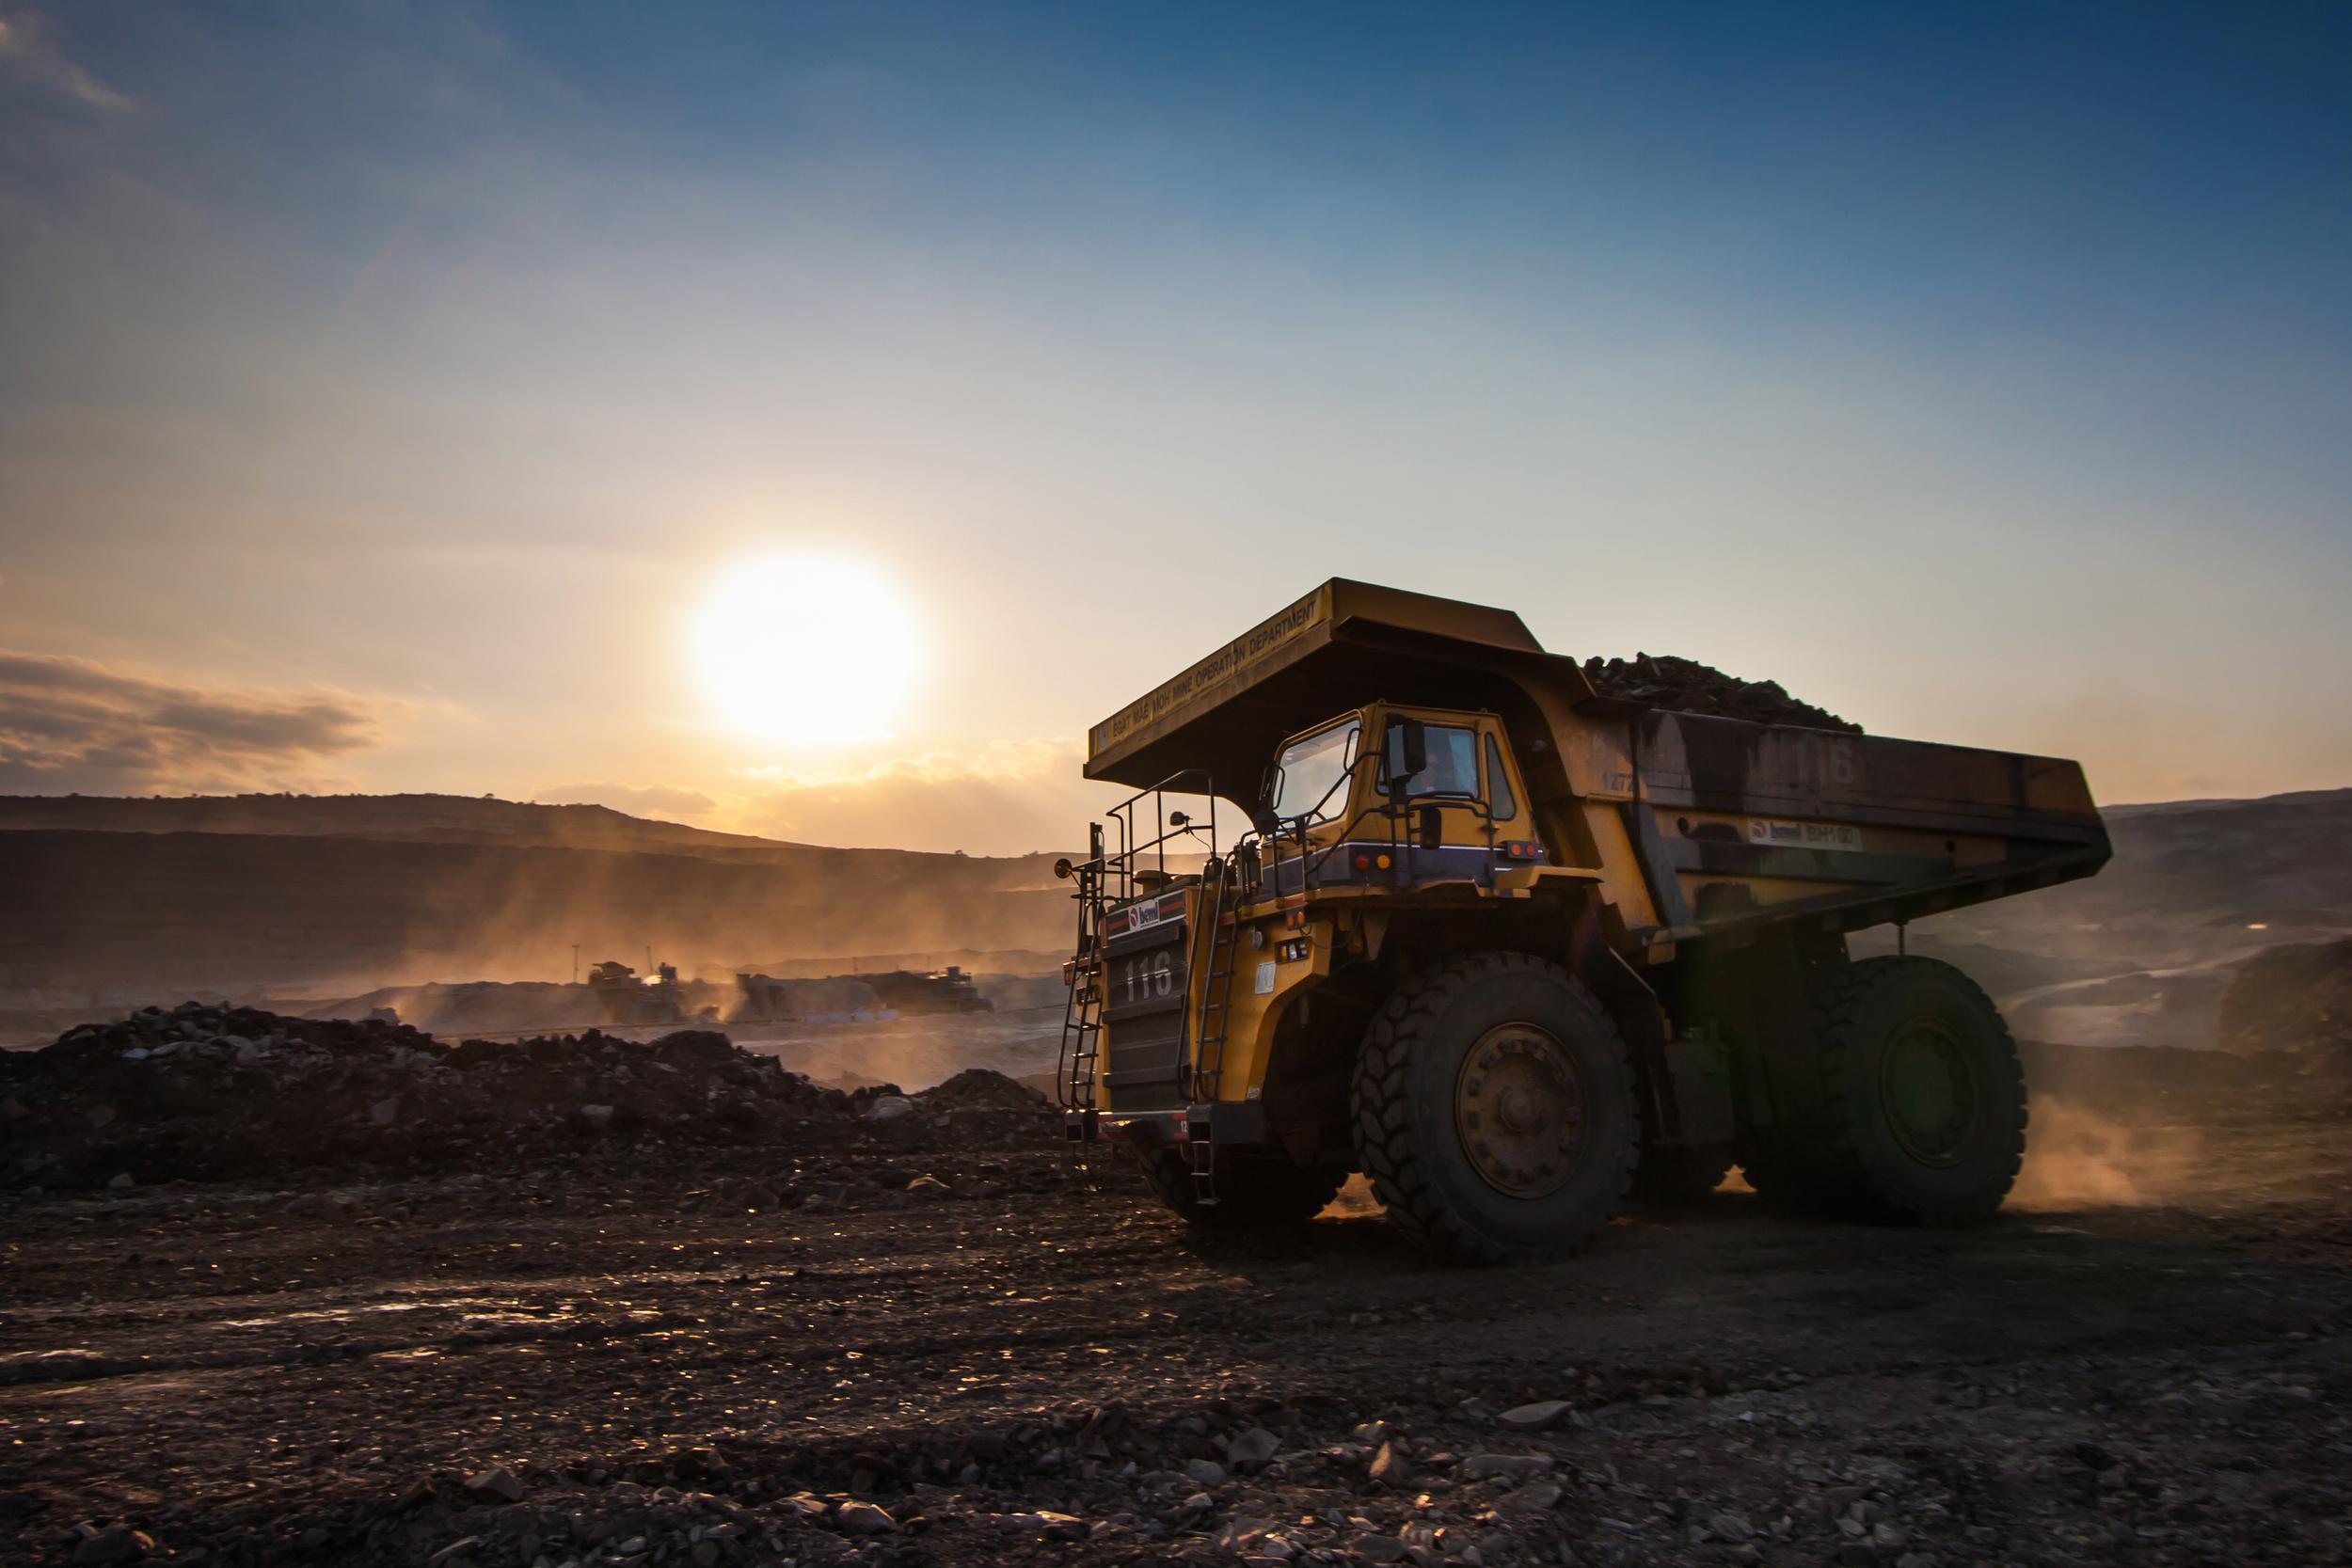 bigstock-Coal-preparation-Plant-Big-Ye-90725906.jpg